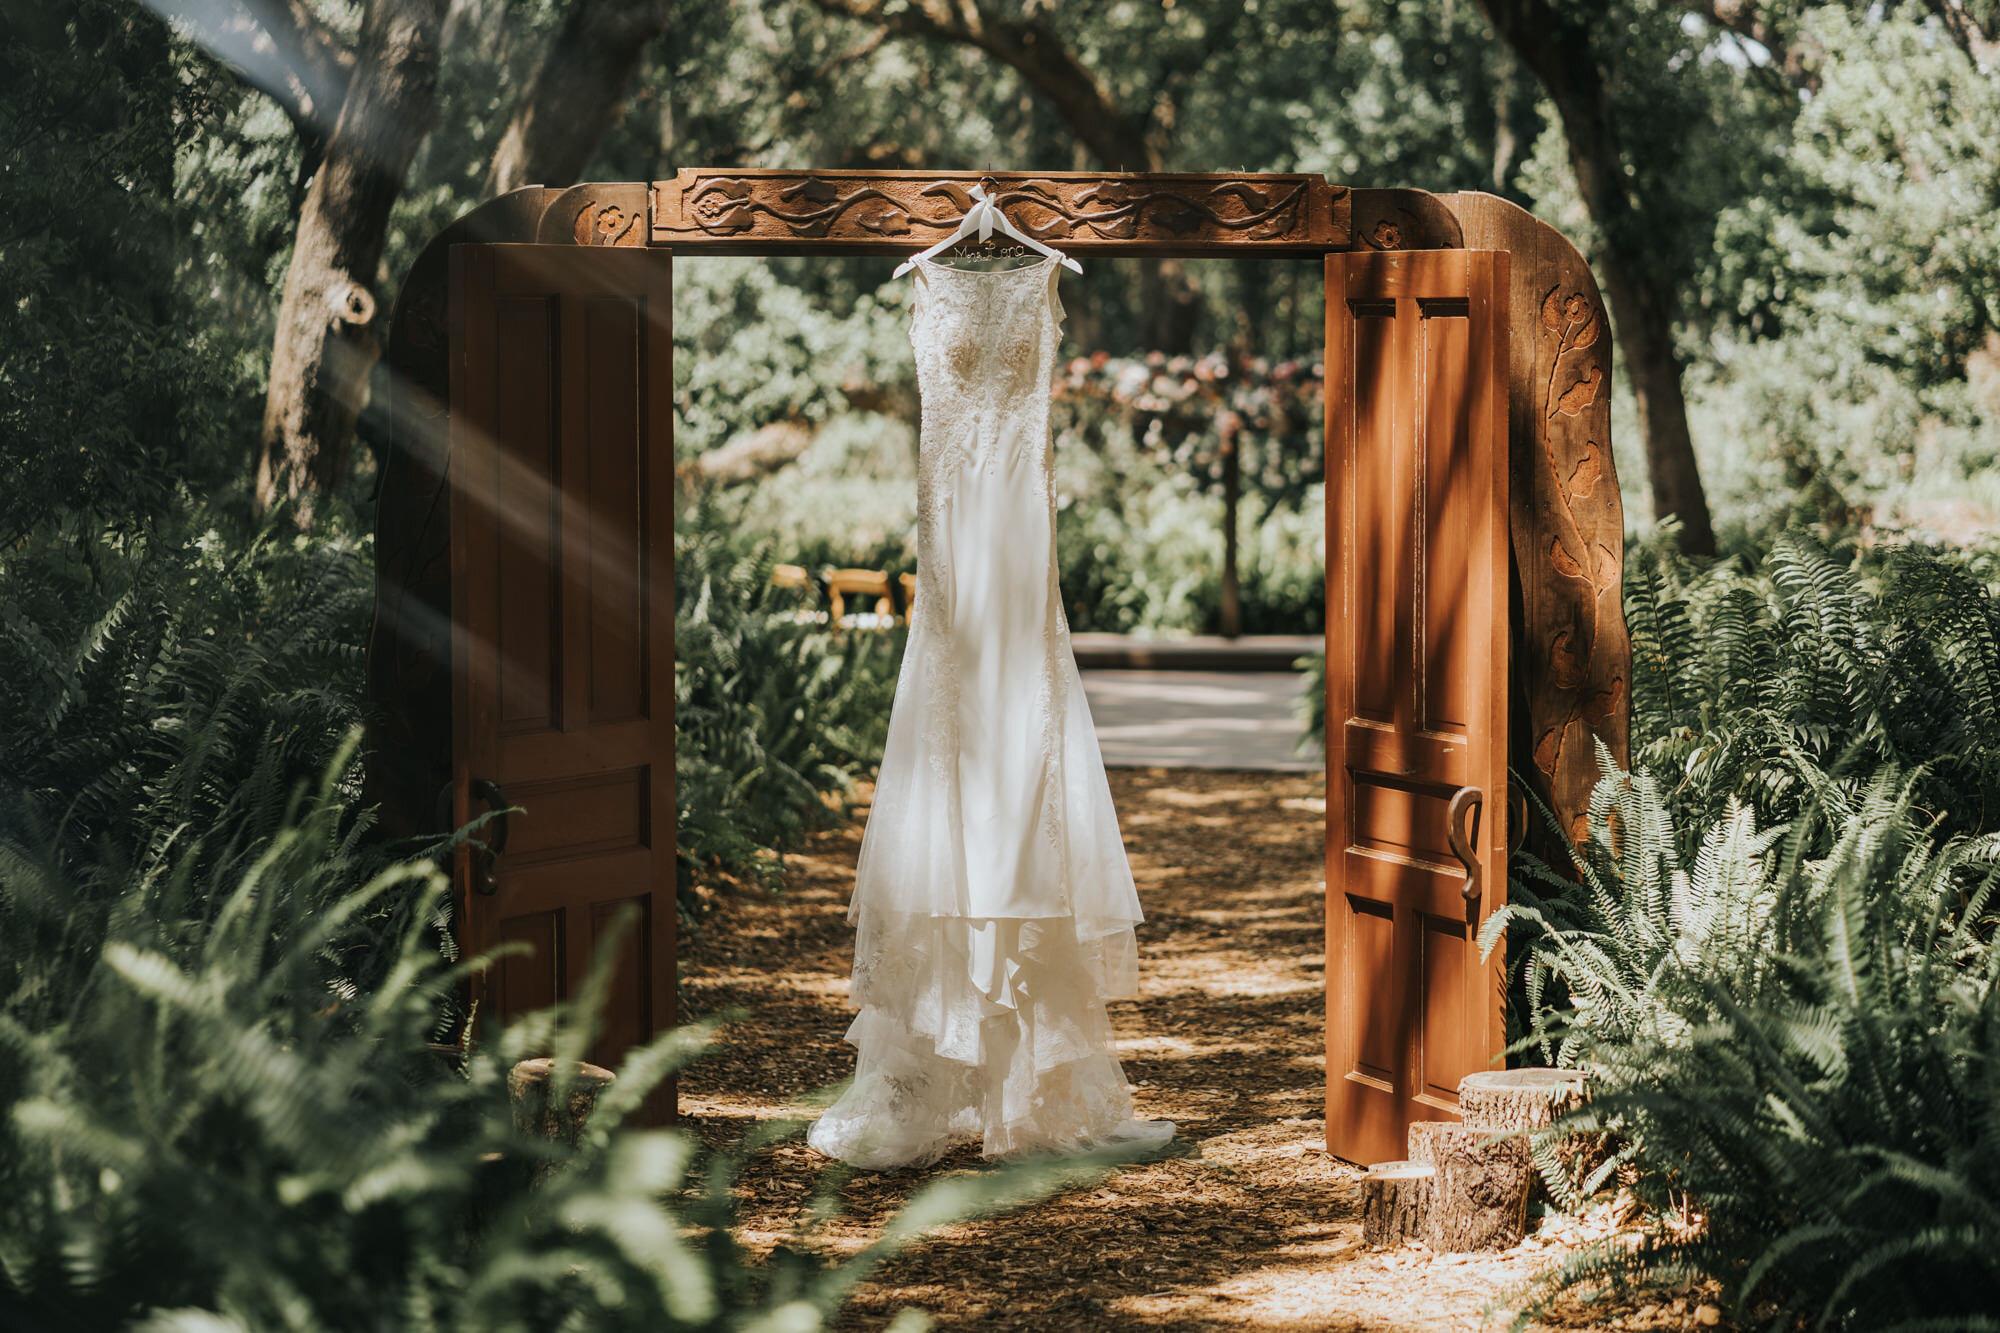 017Sean_Emily_Wedding_3-30-19.jpg